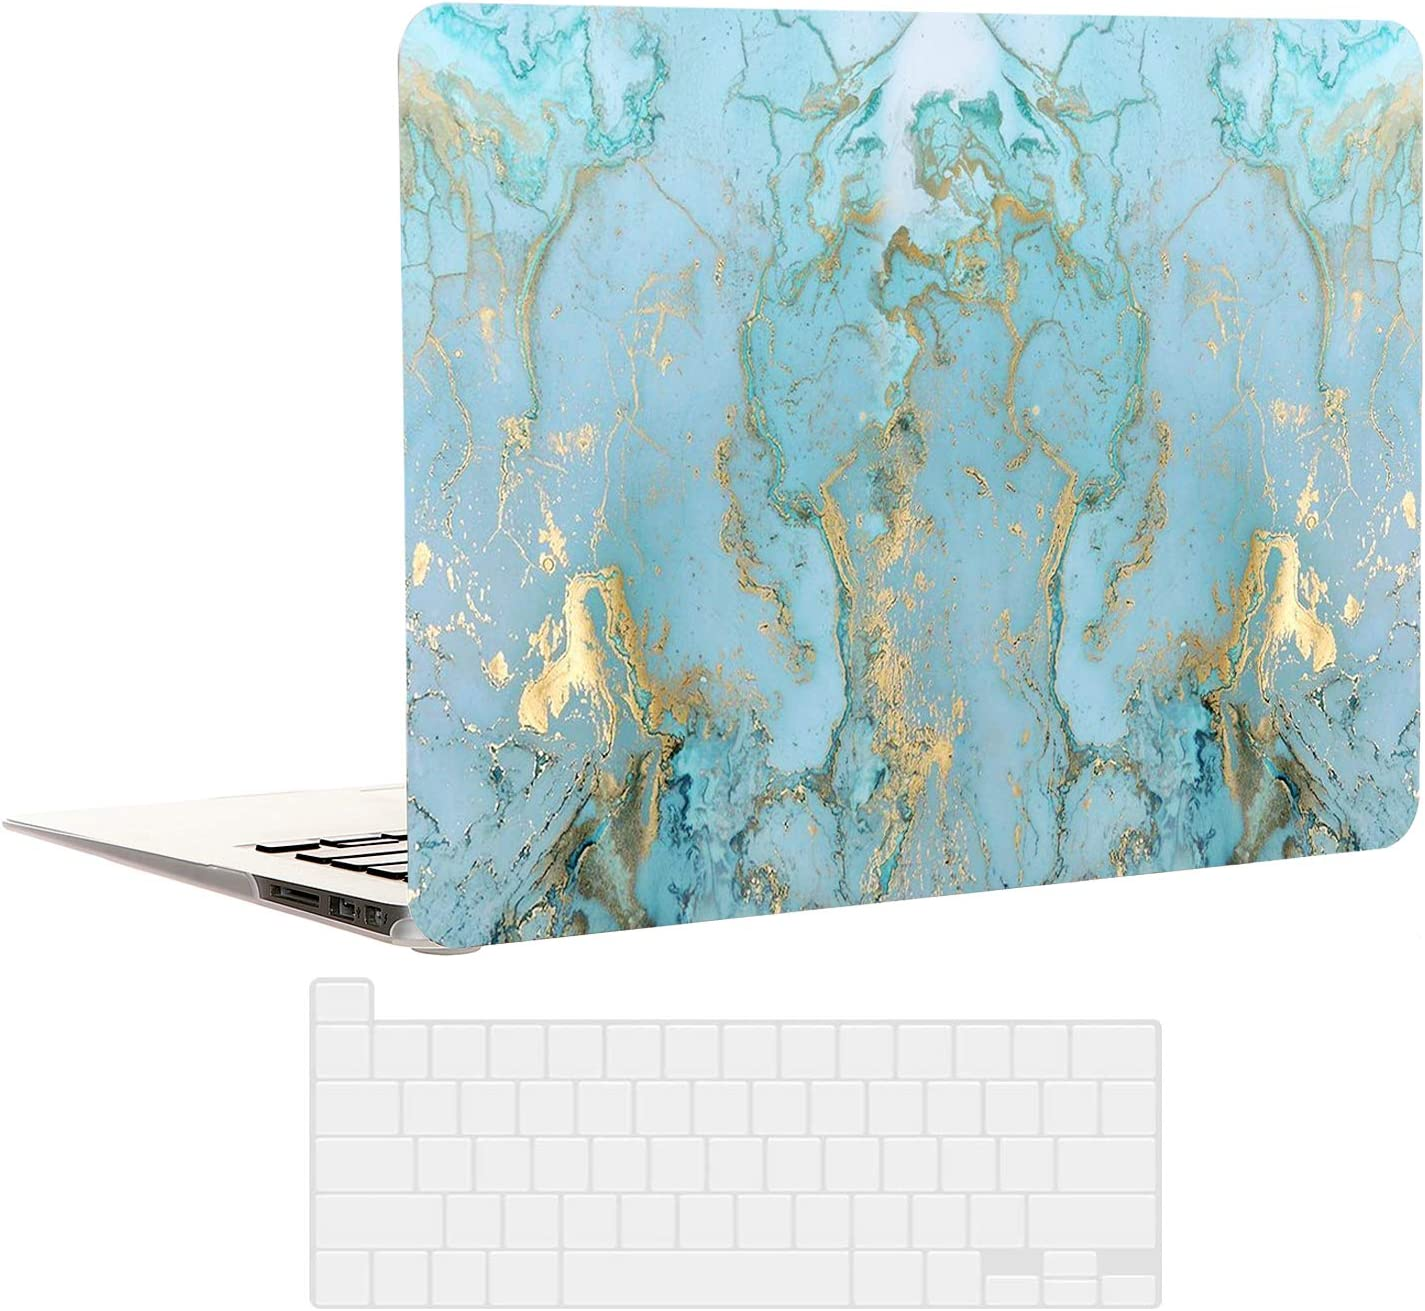 EkuaBot Blue Marble List price MacBook Pro Keybo 13 inch Transparent Case Ranking TOP1